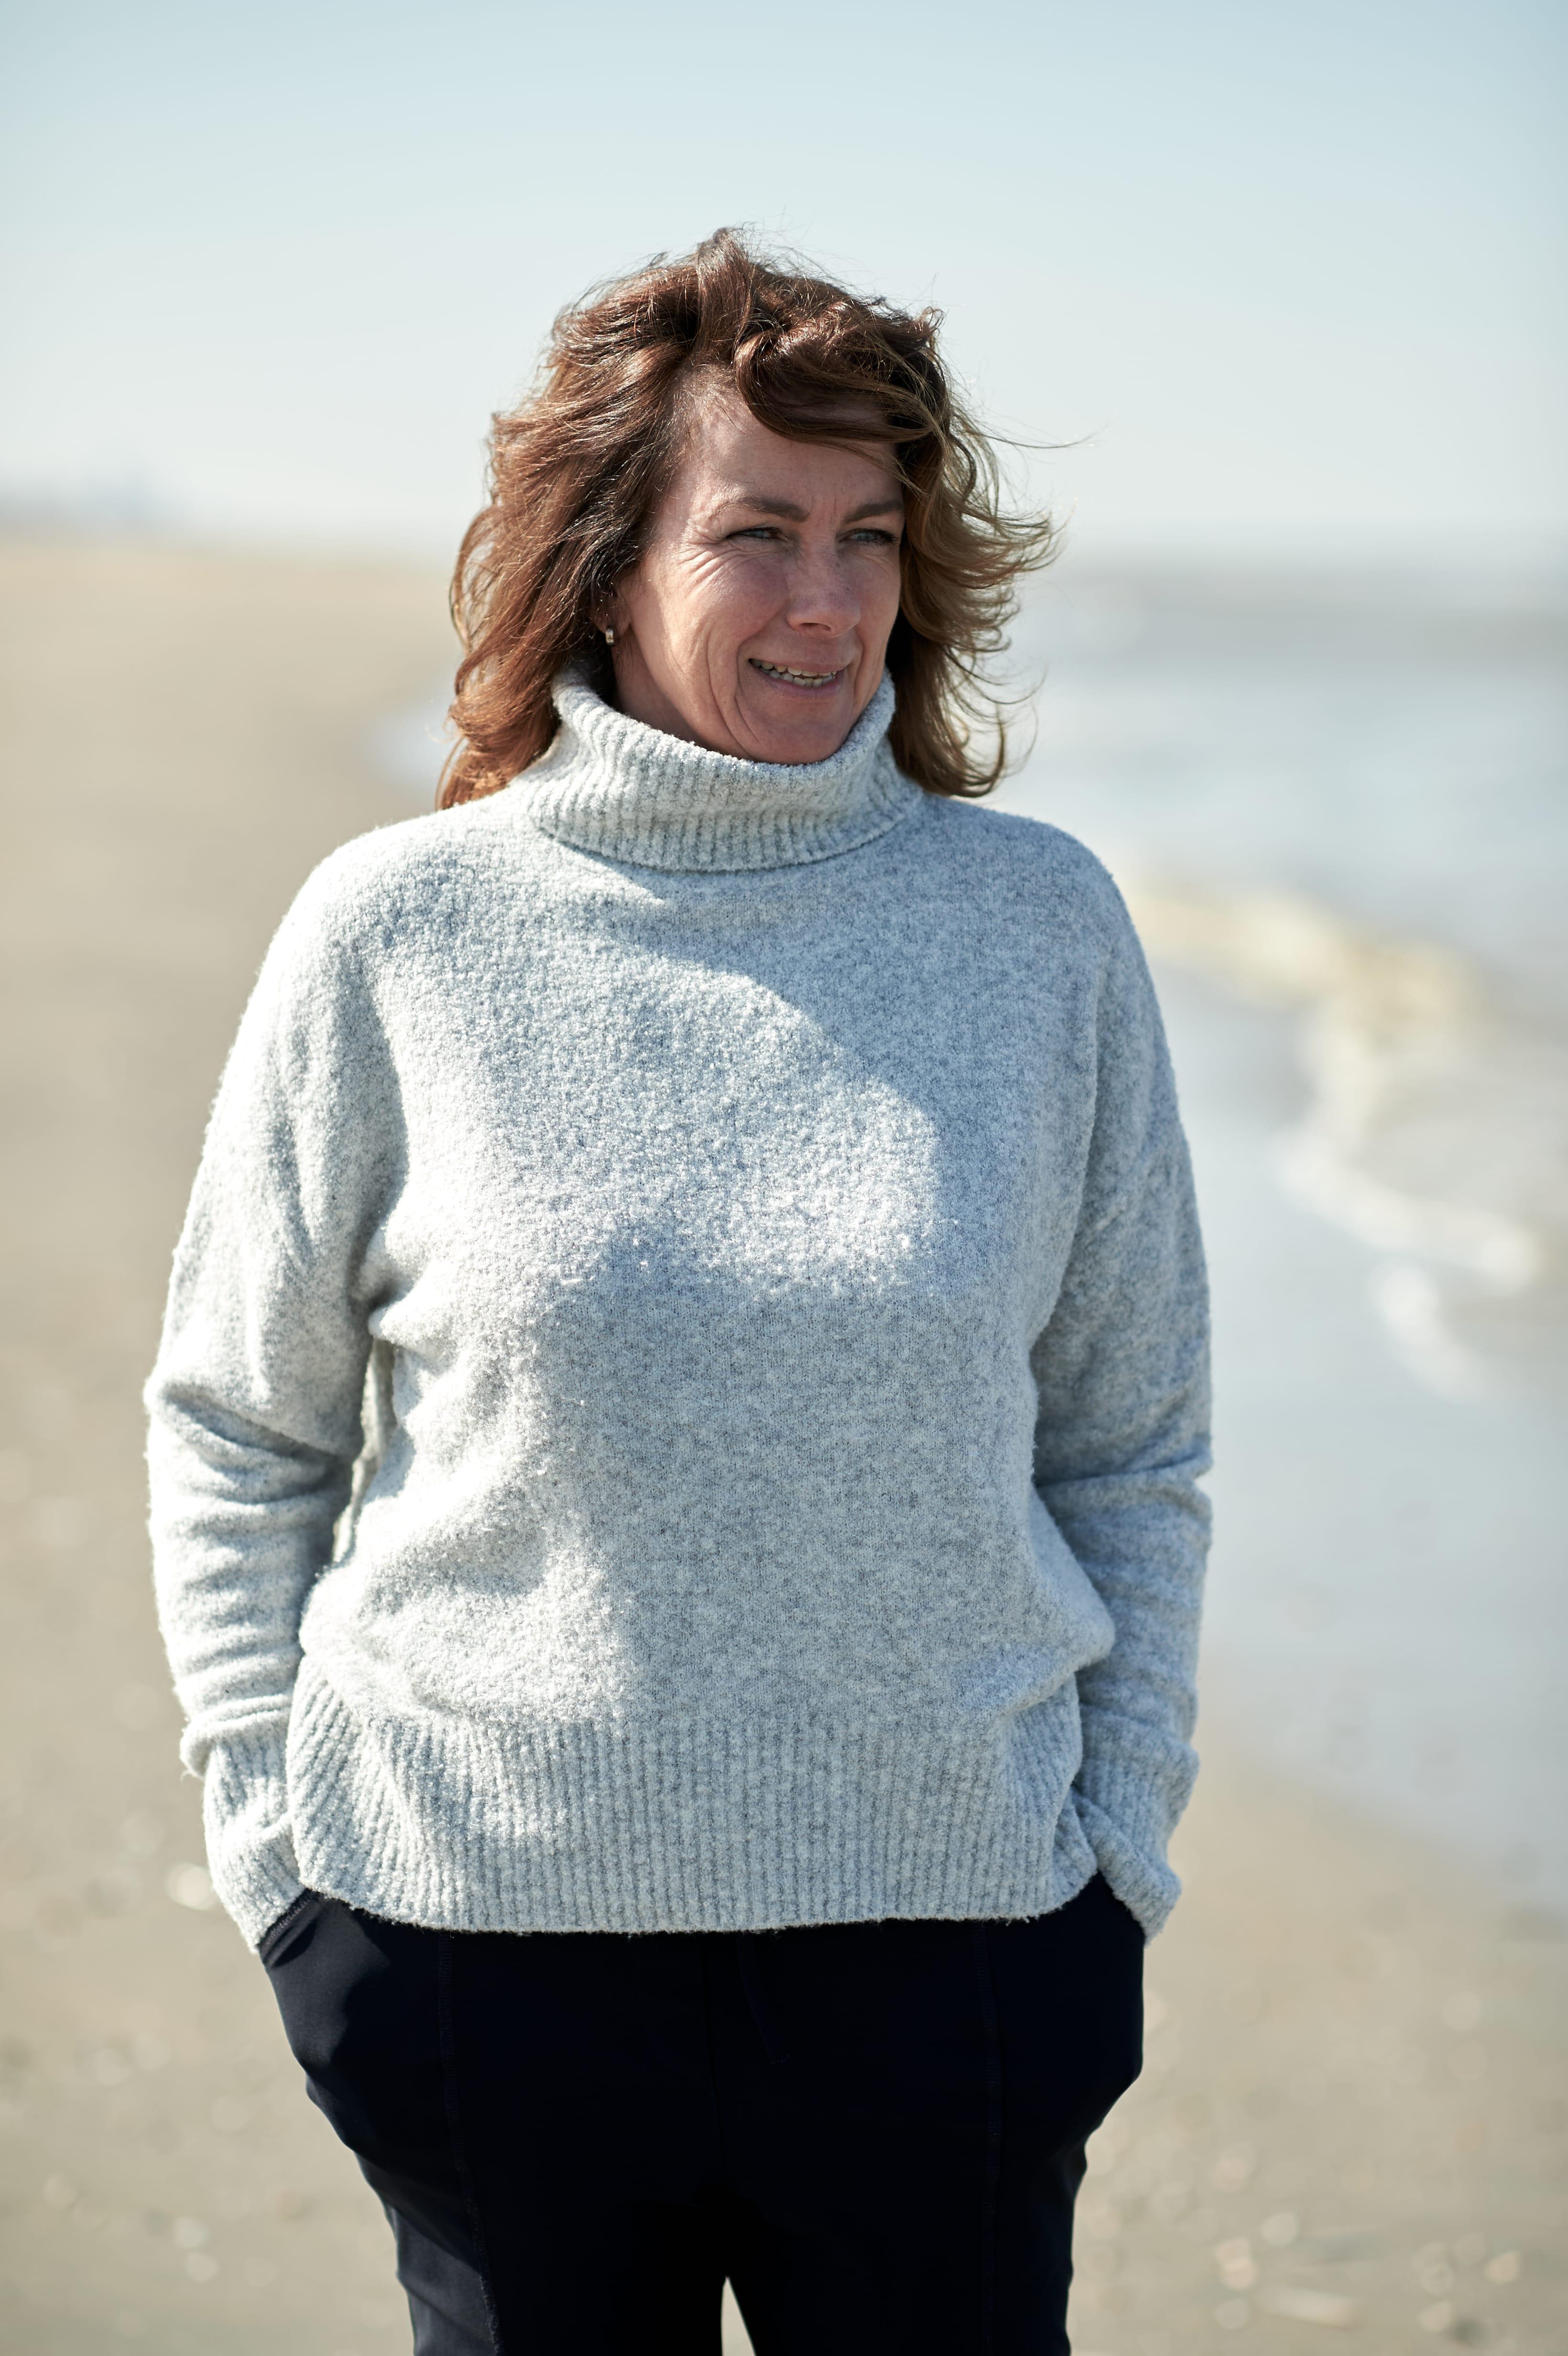 Jeannette Samplonius, Consultant